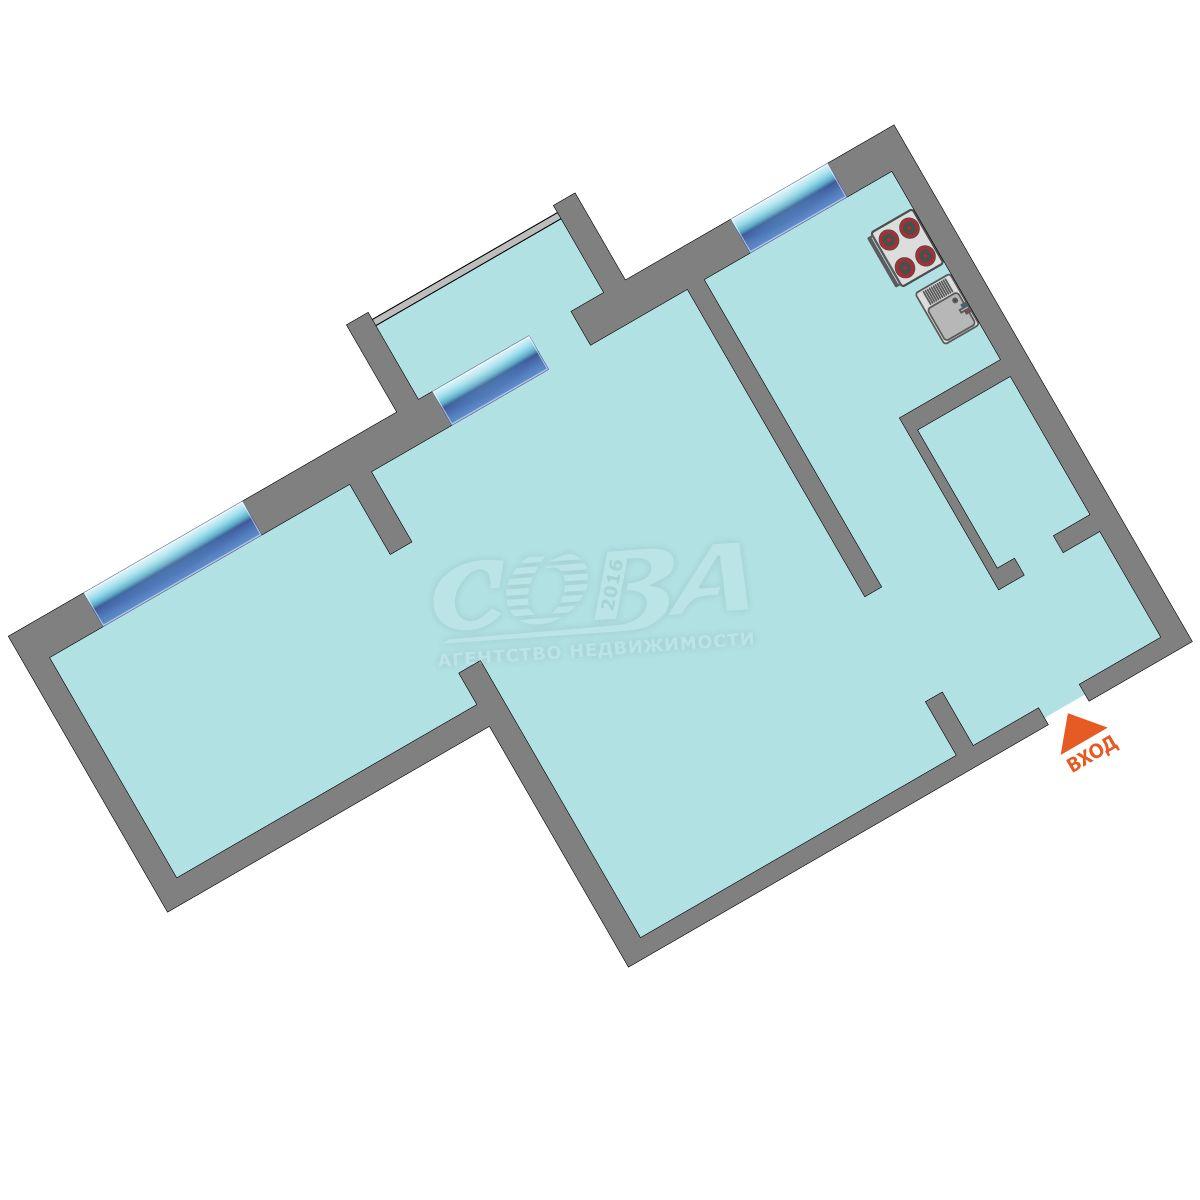 2 комнатная квартира  в районе Технопарка, ул. 50 лет ВЛКСМ, 69, г. Тюмень